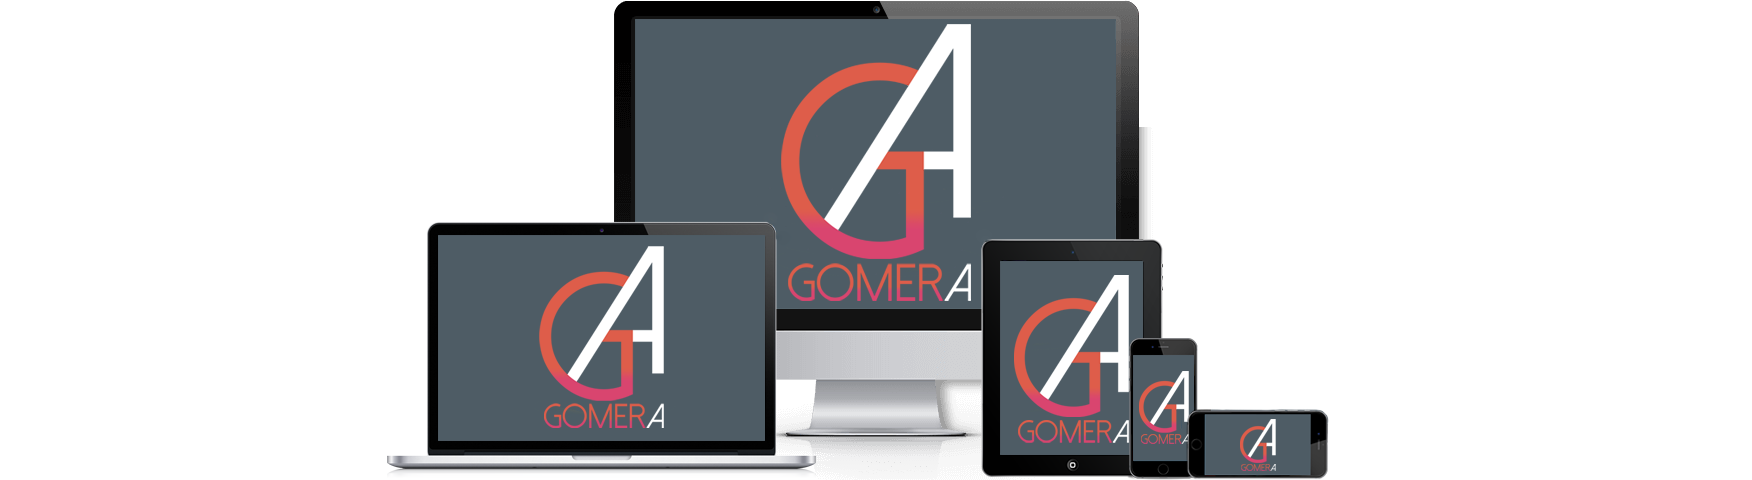 Création site internet responsive design, ordinateur, tablette, mobile